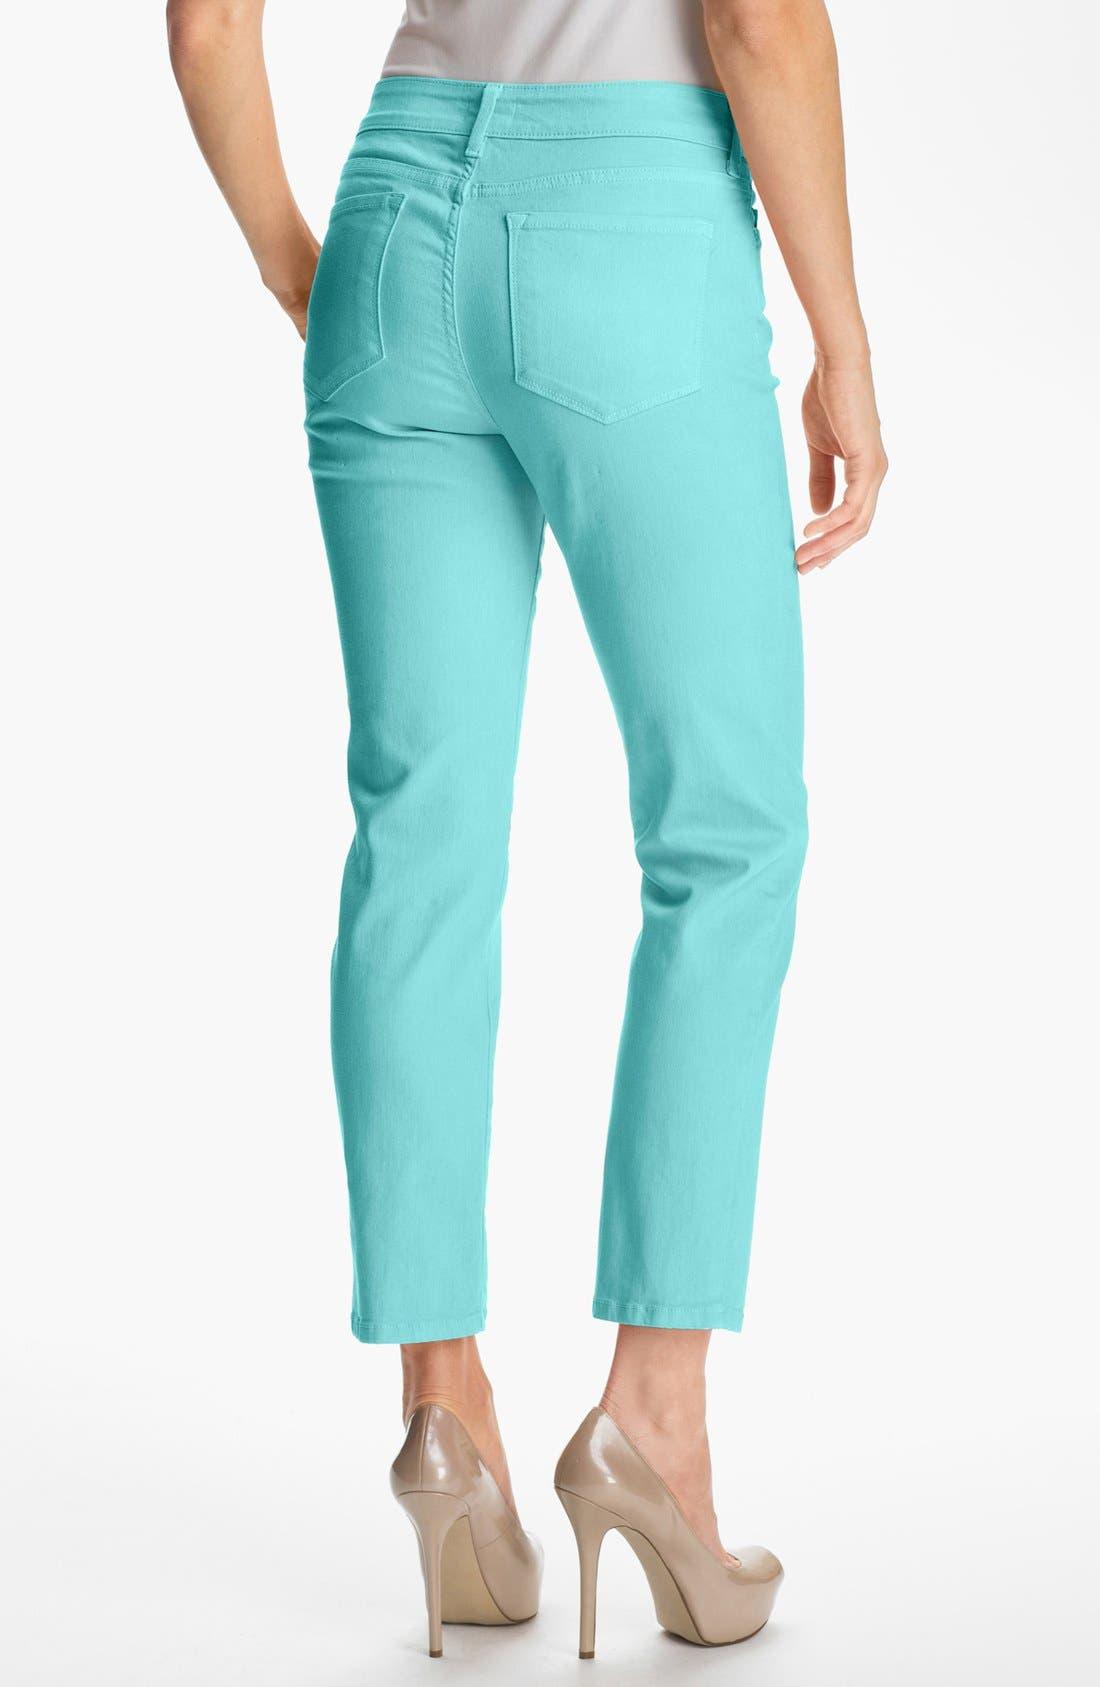 Alternate Image 2  - NYDJ 'Alisha' Colored Stretch Ankle Skinny Jeans